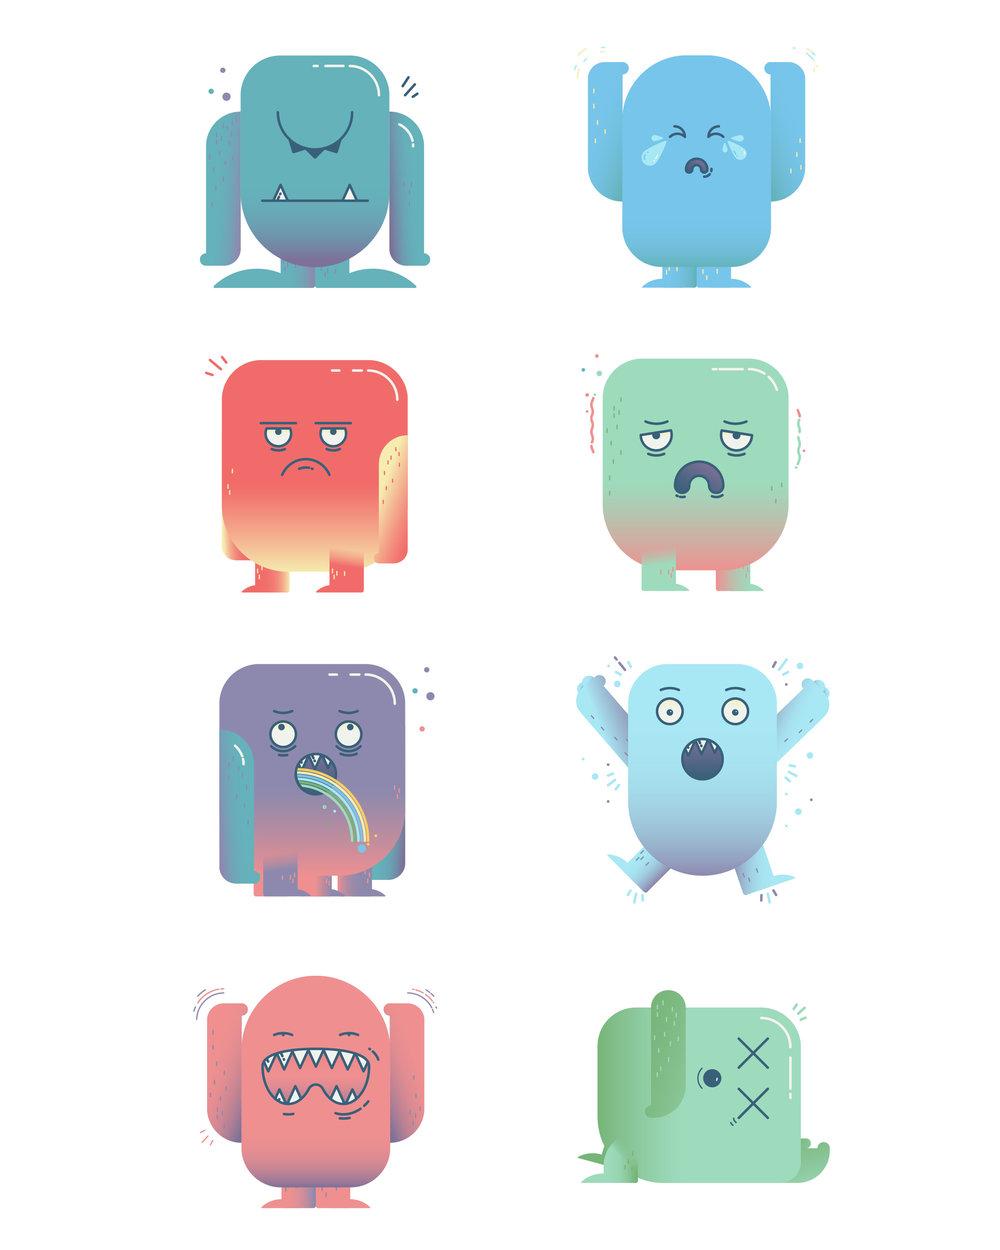 stickers-1.jpg